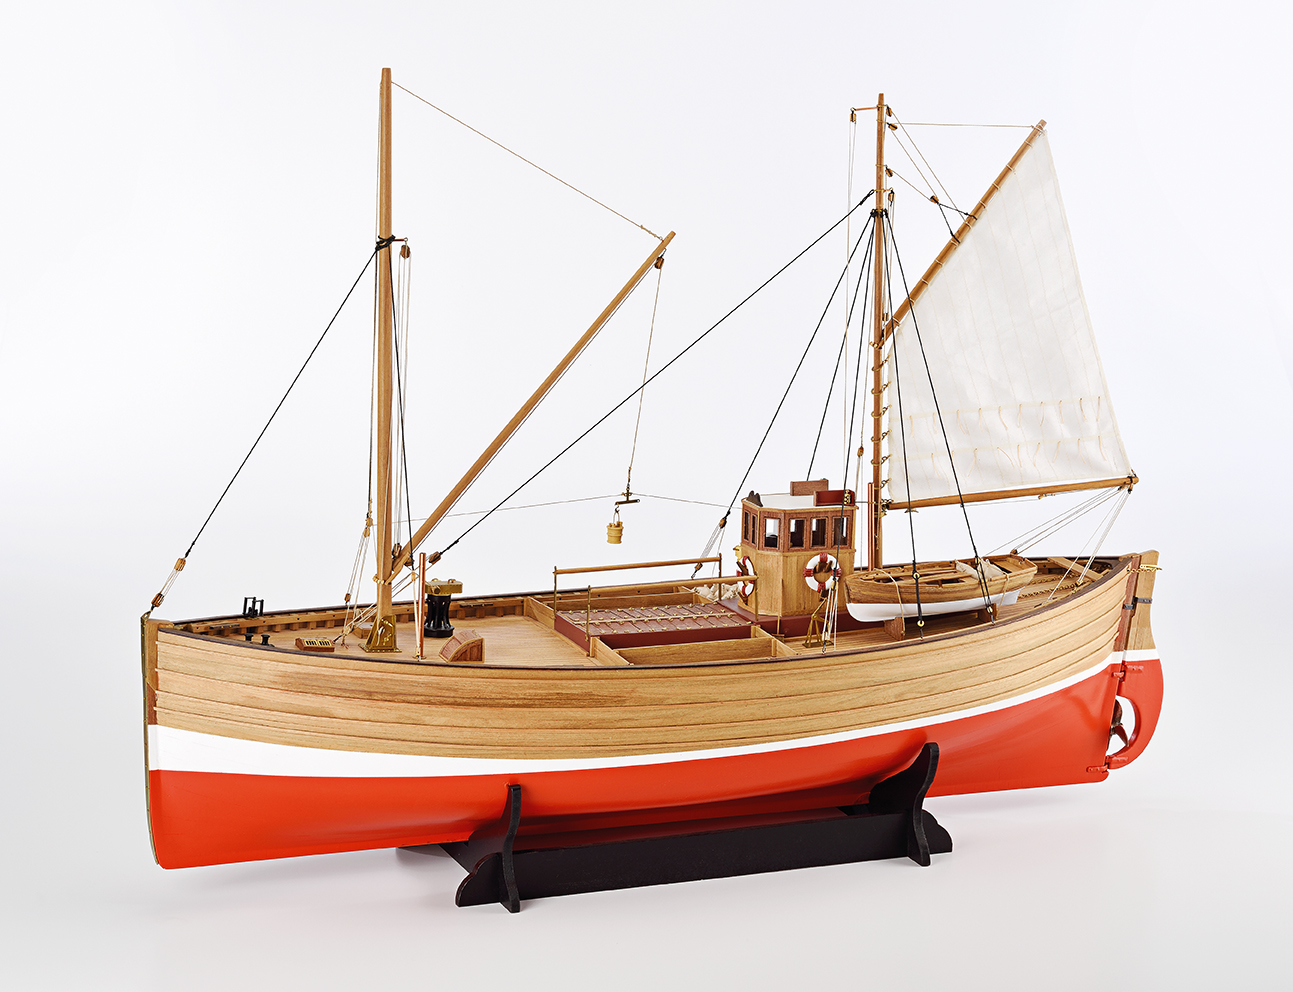 Euromodels | Victory Models Boat kits